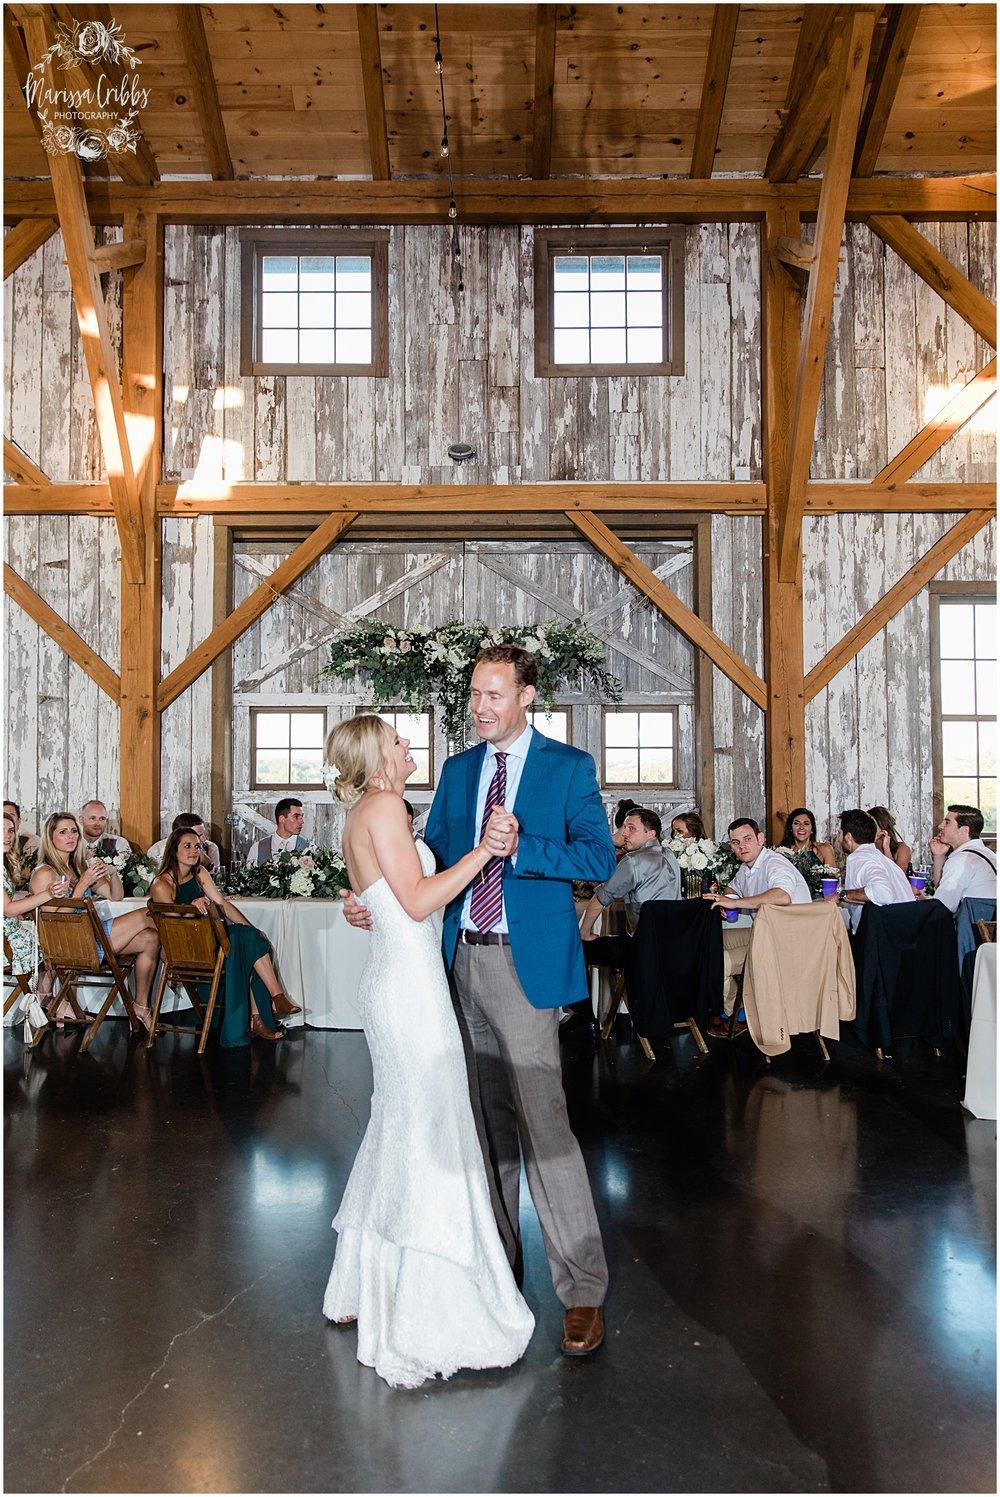 RHODES WEDDING | WESTON RED BARN FARM | MARISSA CRIBBS PHOTOGRAPHY_5316.jpg